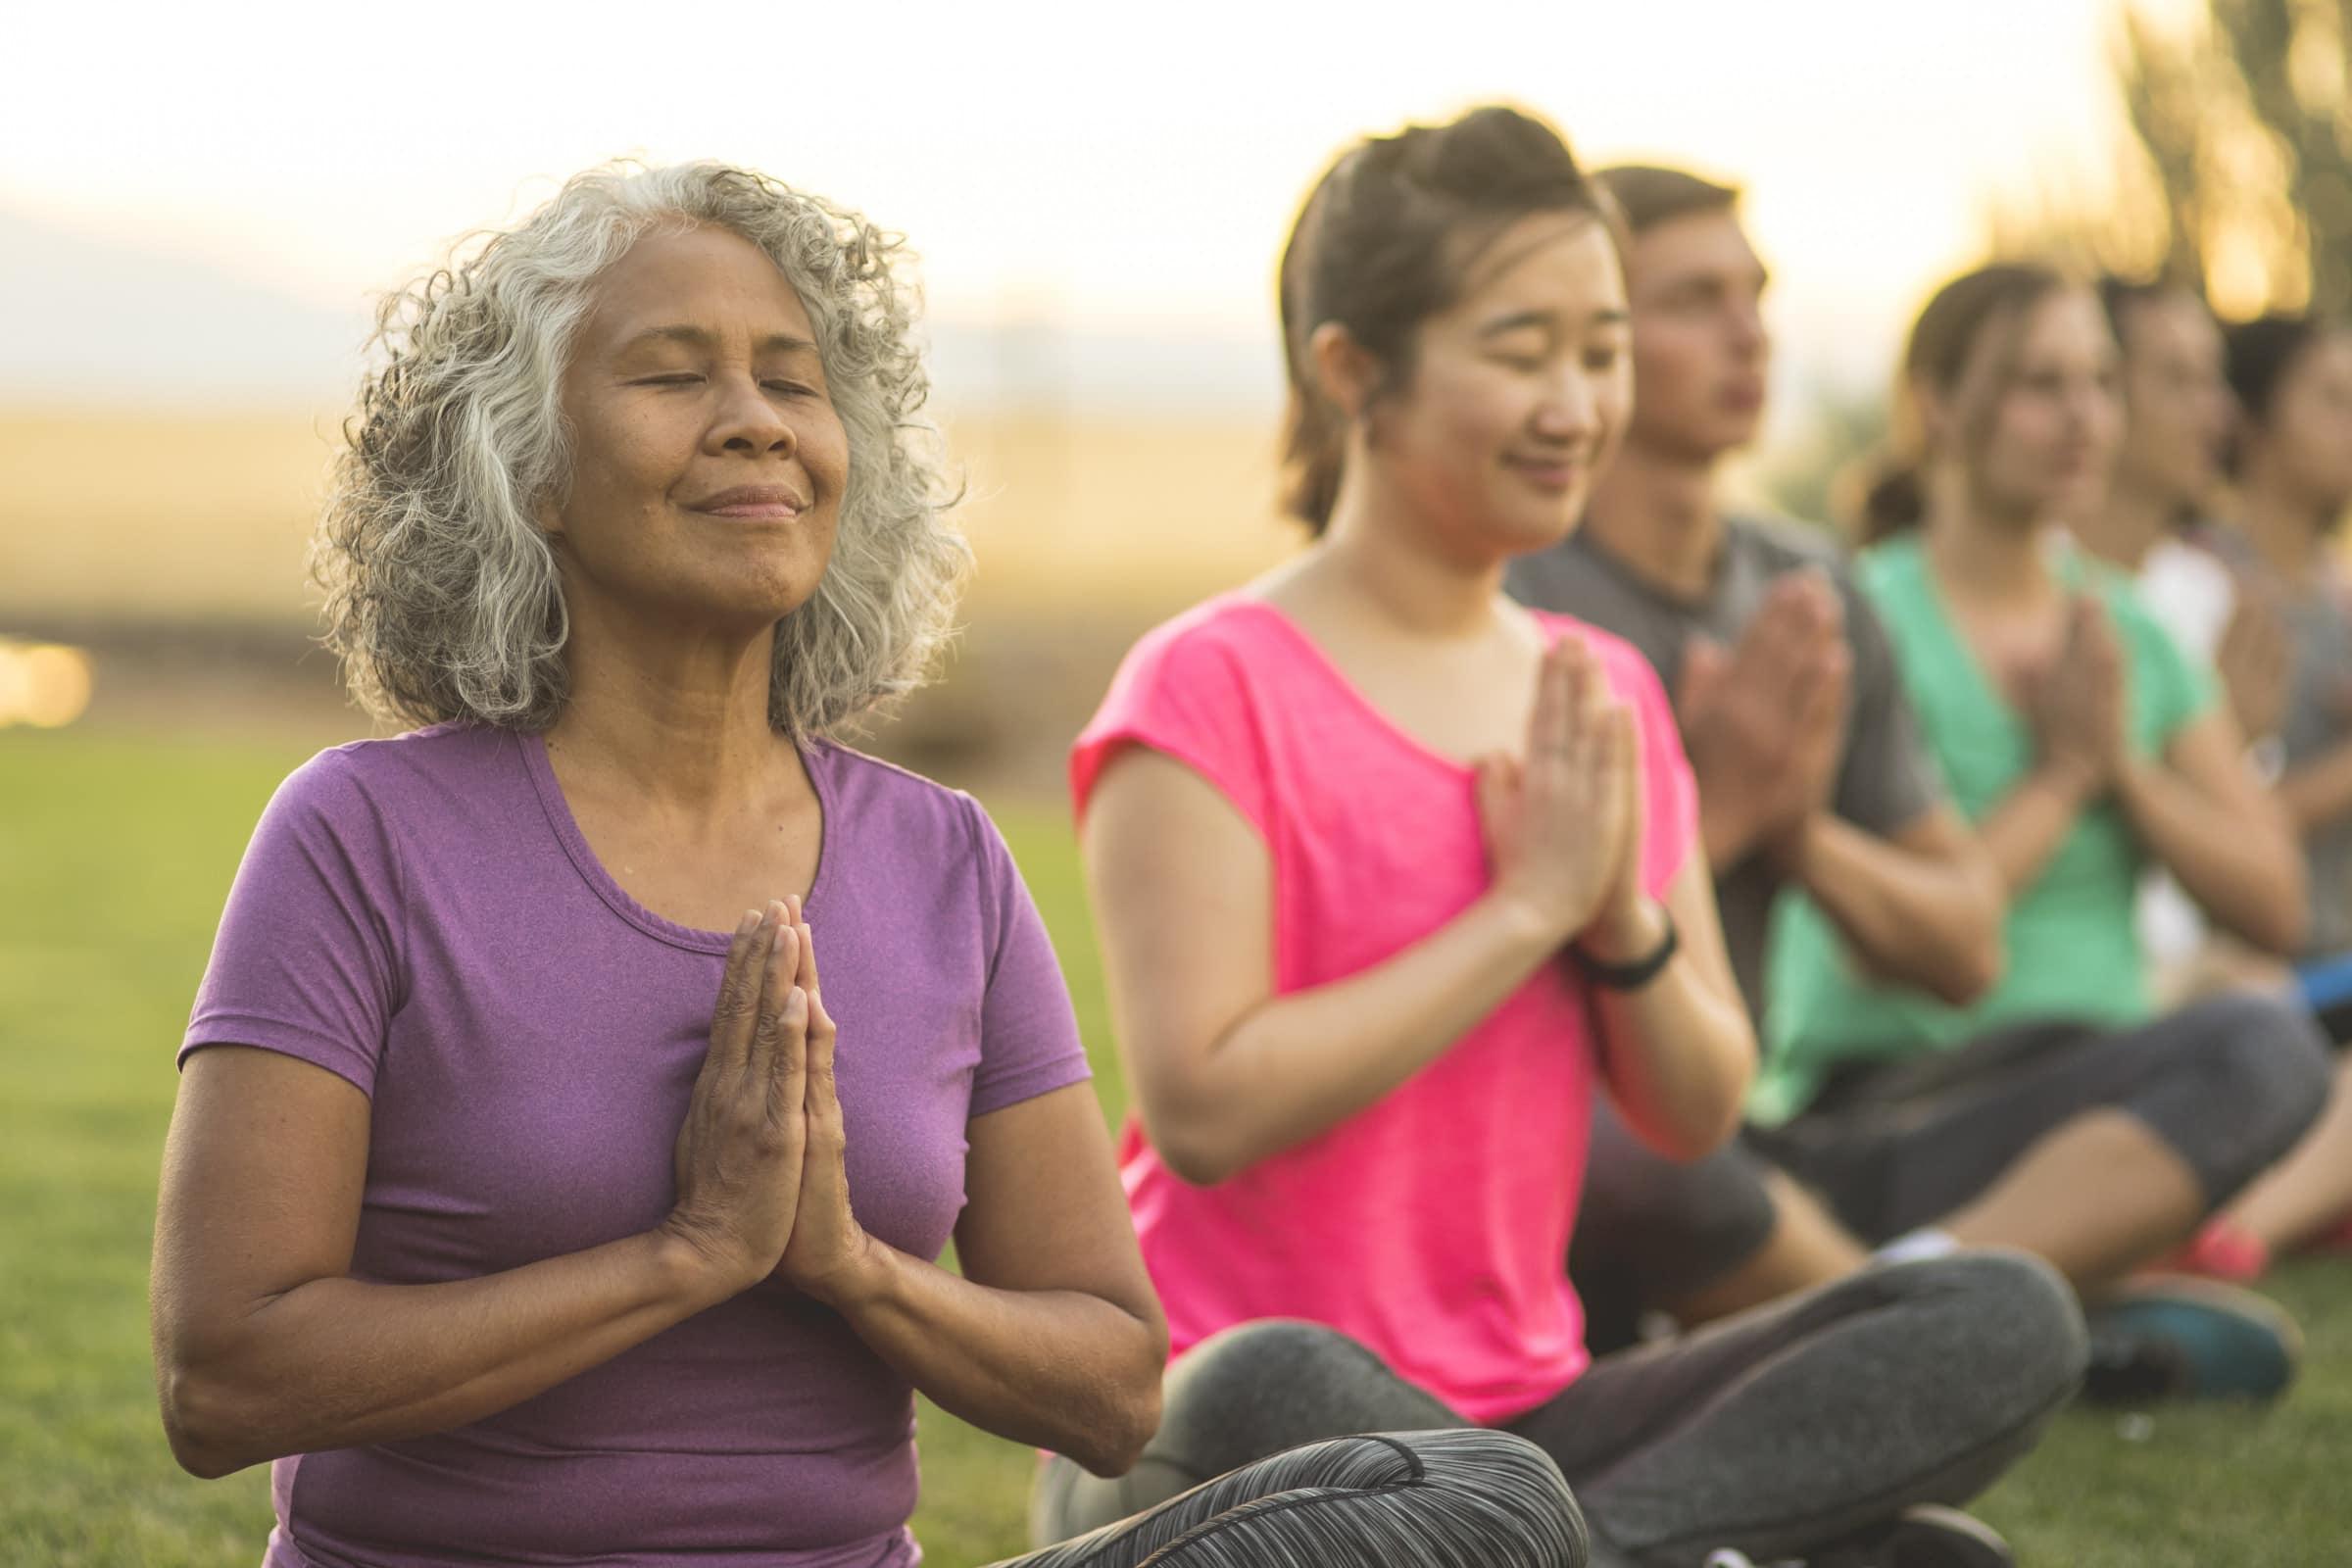 Self-care advice woman doing yoga